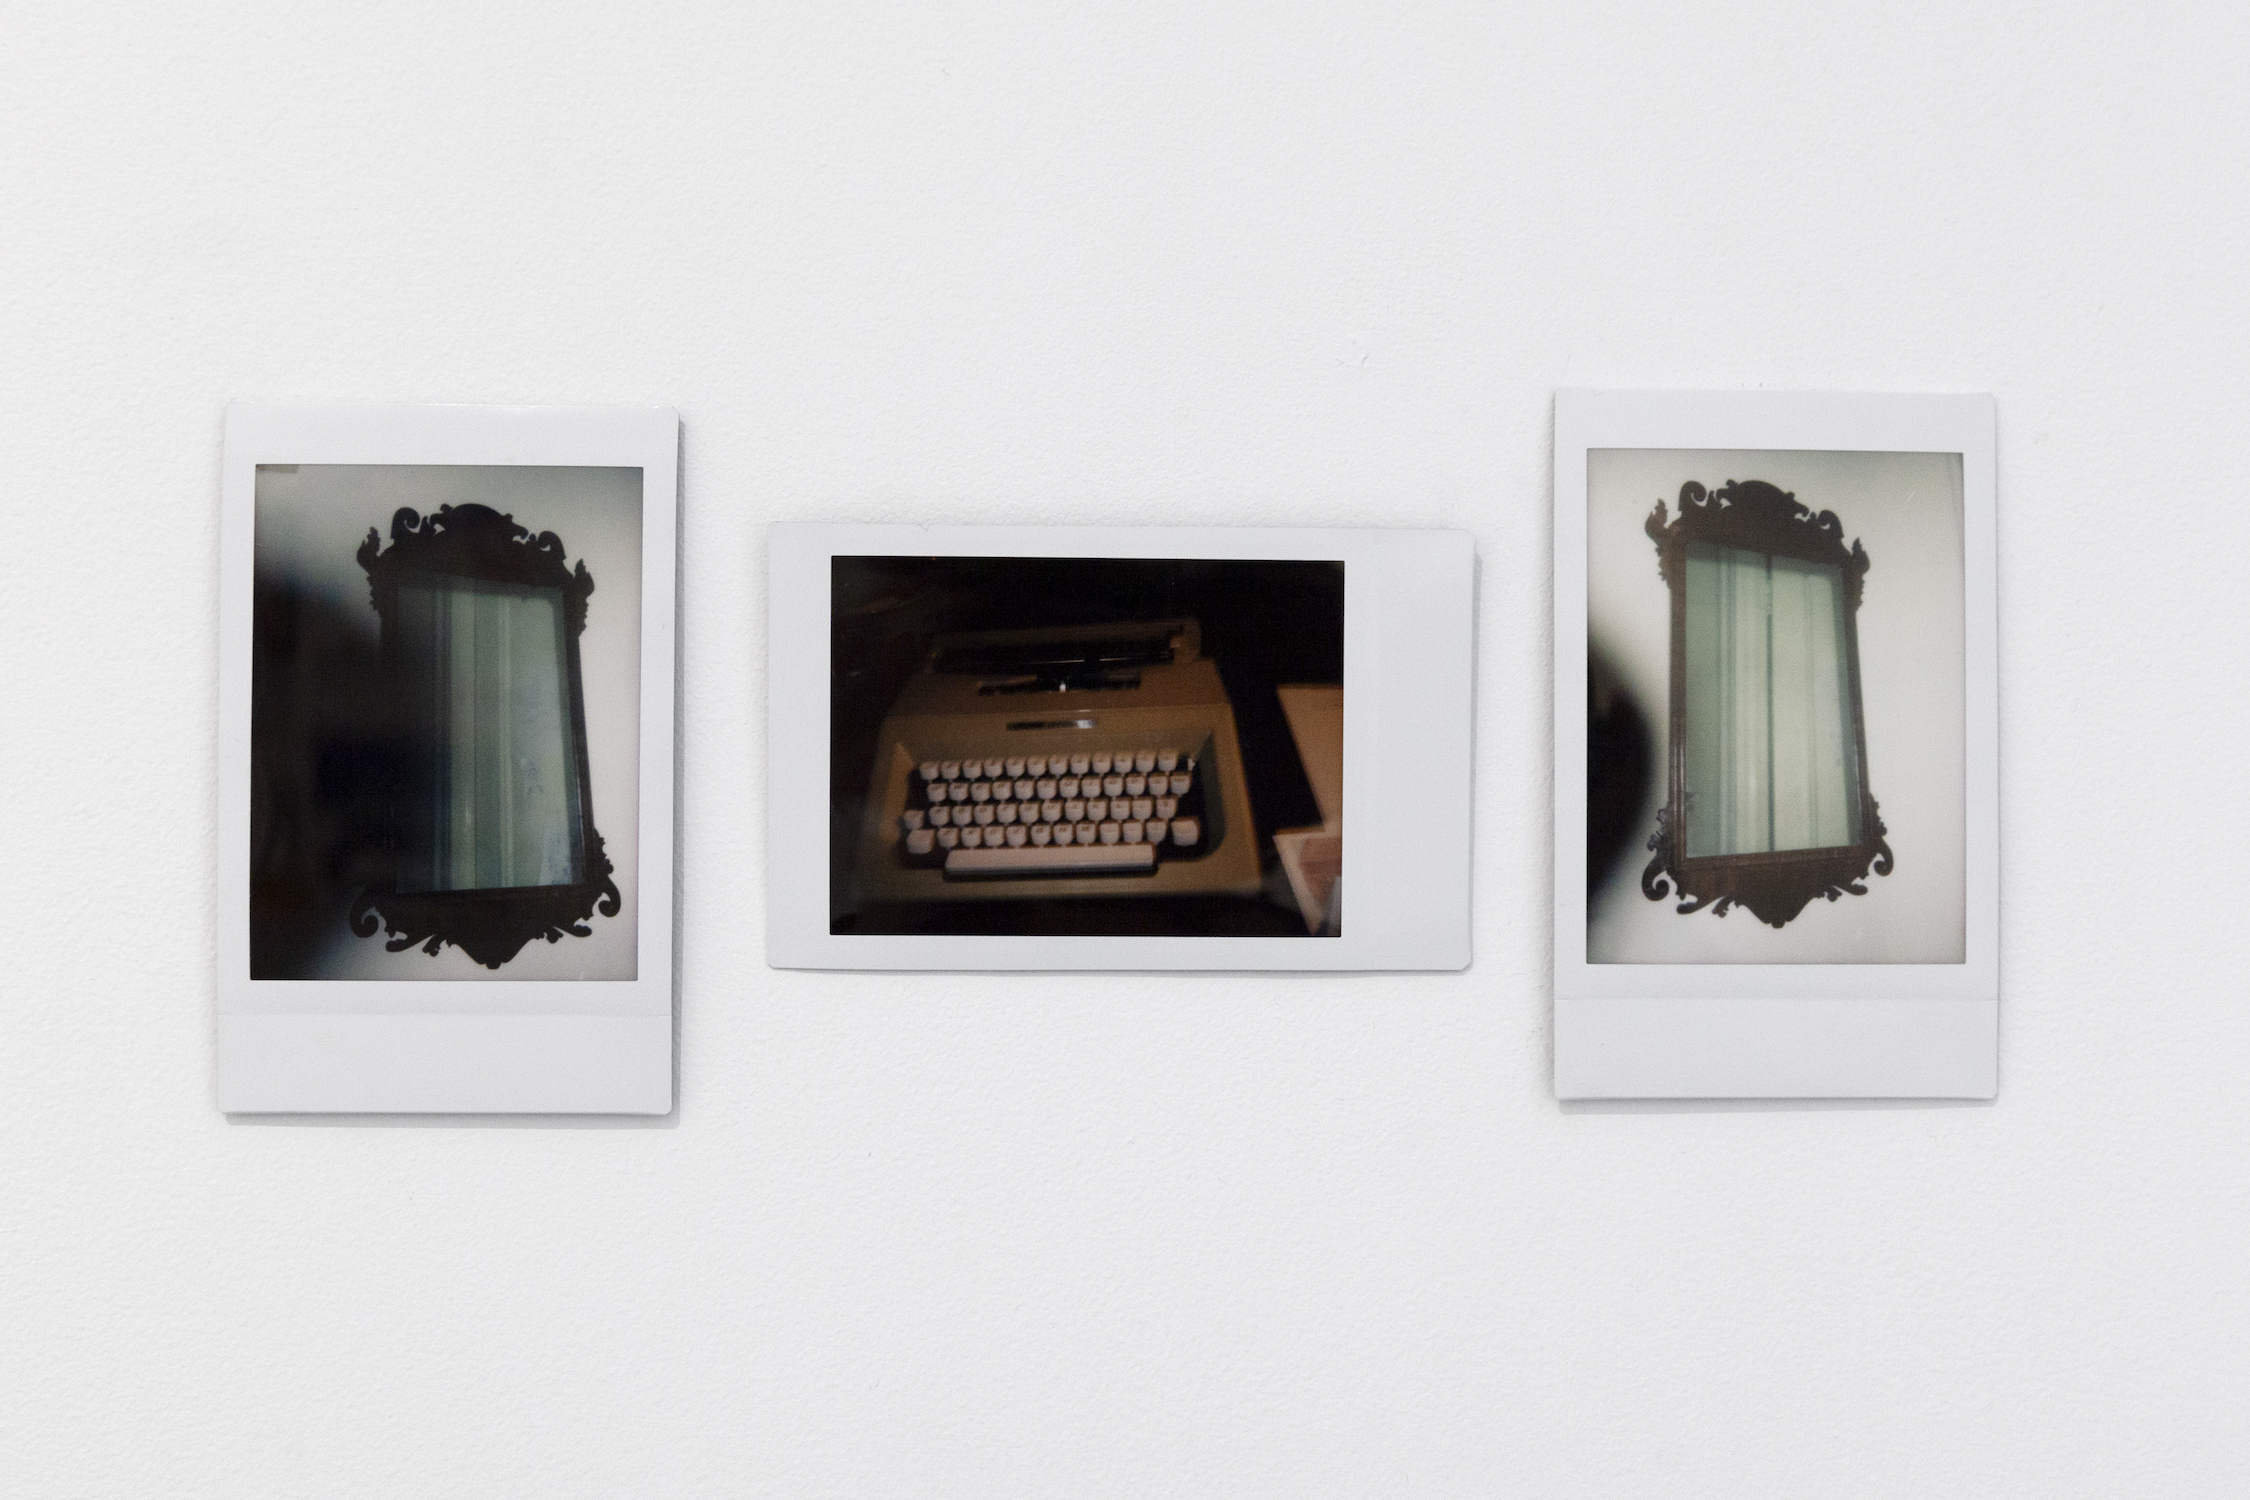 Julian Remmel   Ghost , 2018 Polaroid print triptych 3.39 x 2.13 inches each (8.61 x 5.41 cm)  Starting bid: $20